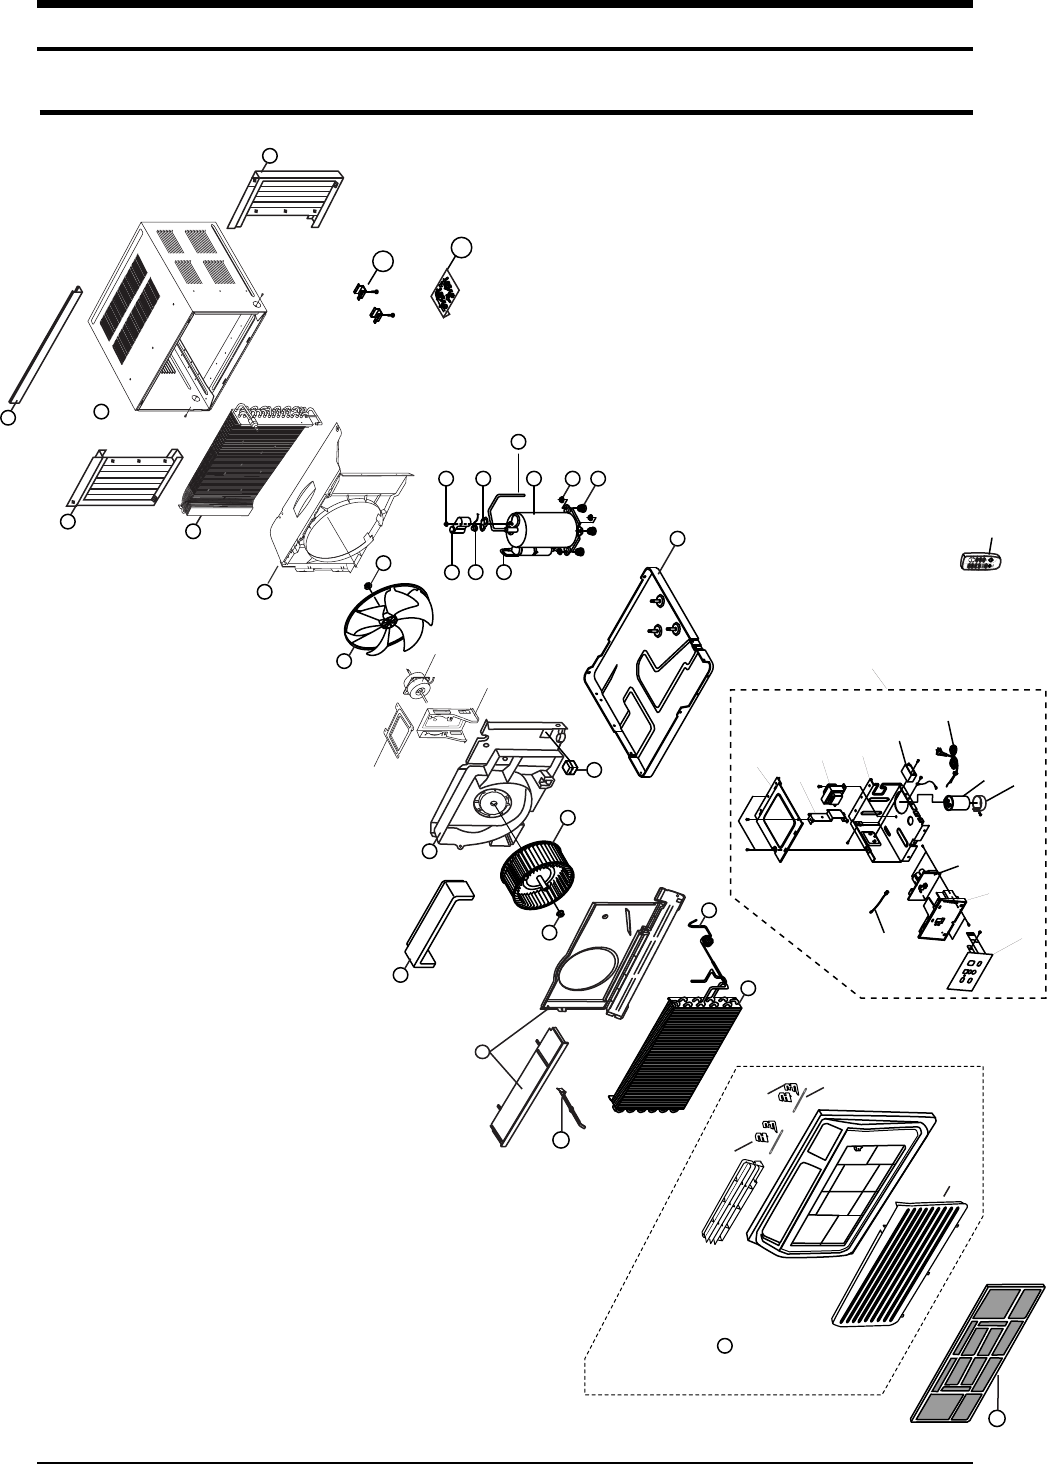 AW1805B Sam0001 Samsung Room Air Conditioner Service Manual